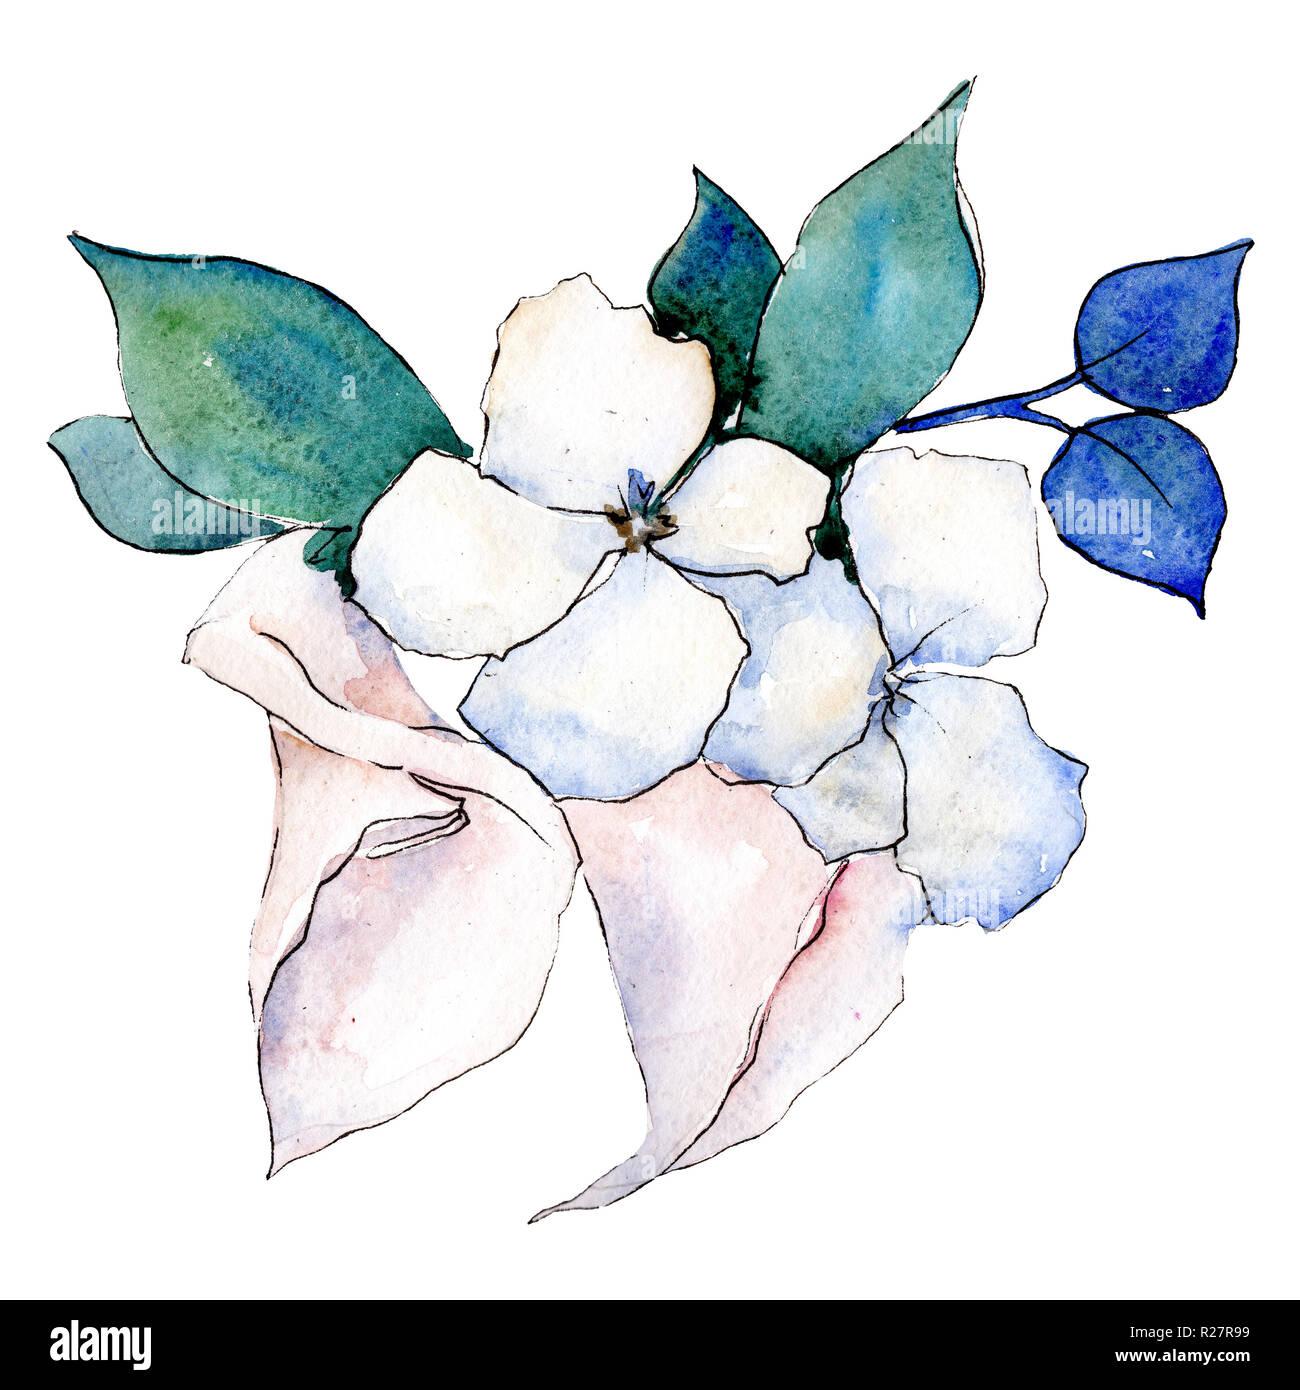 Hortensia Flores Blancas Ilustracion De Flores Aisladas Elemento